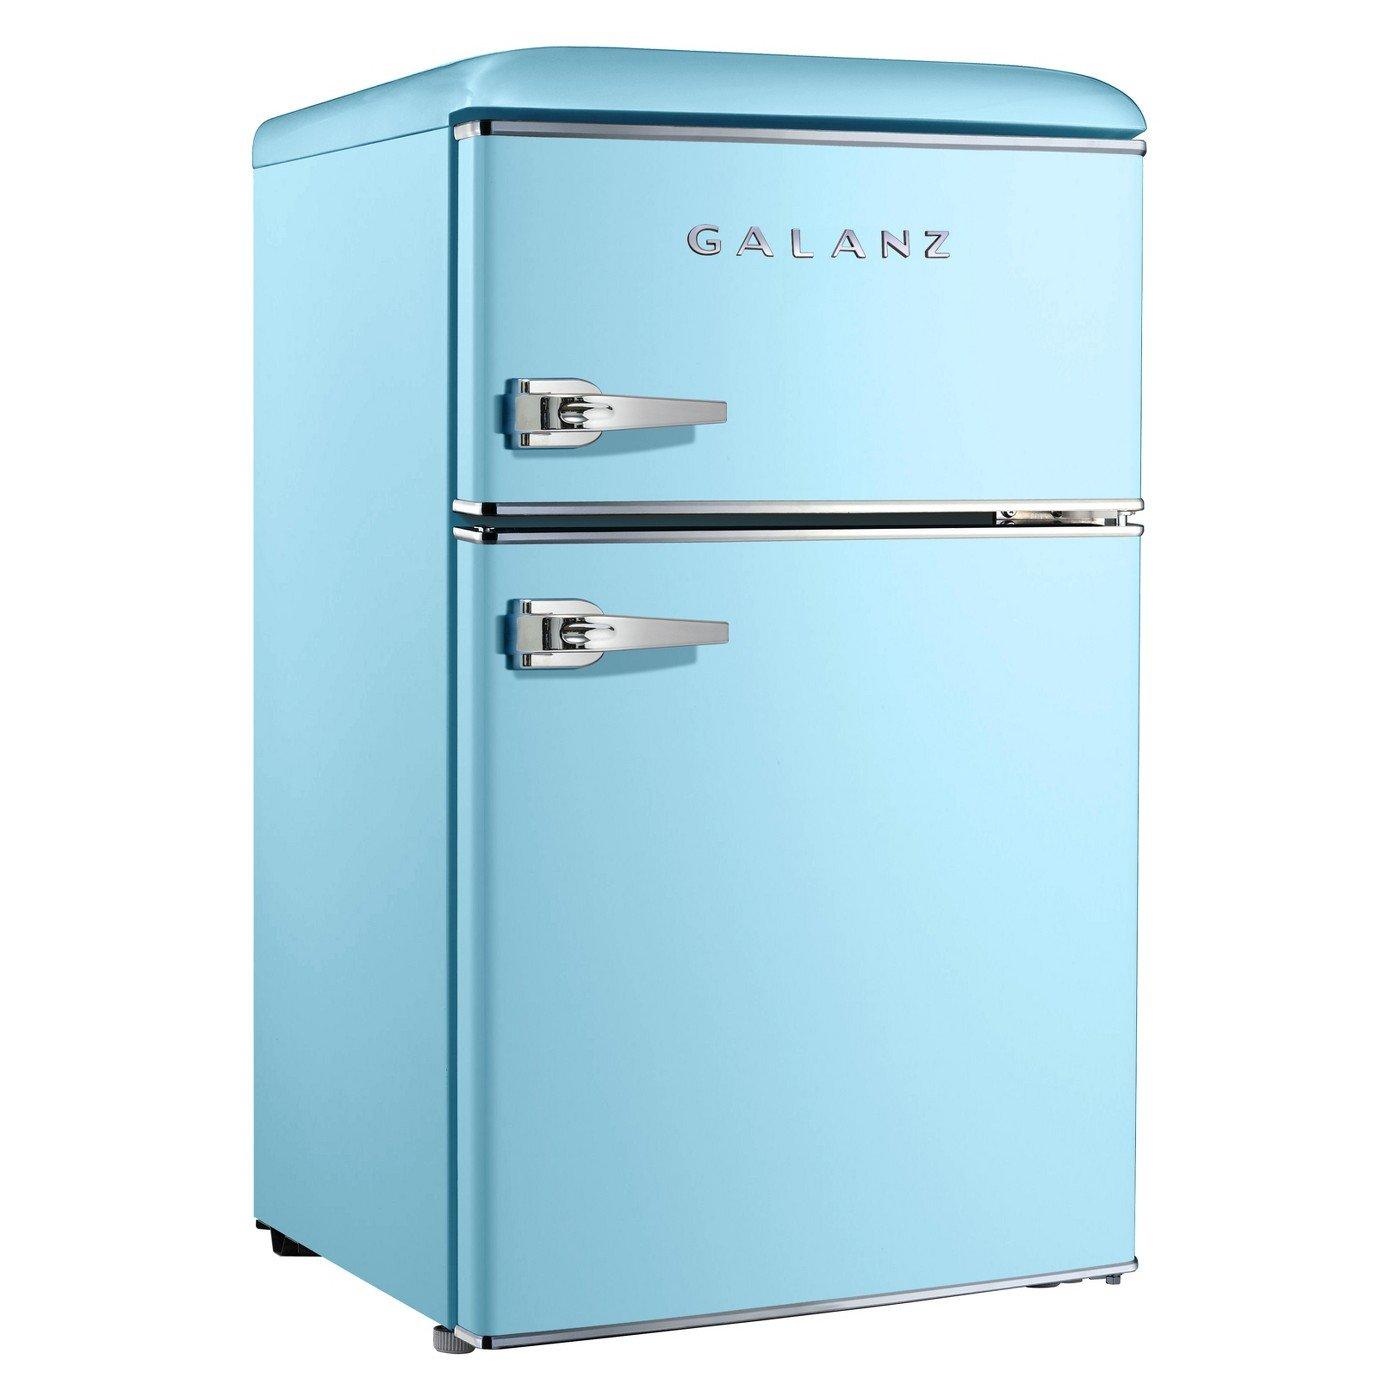 Amazon.com: Galanz 3.1 cu ft Light Blue Retro Mini Fridge: Appliances